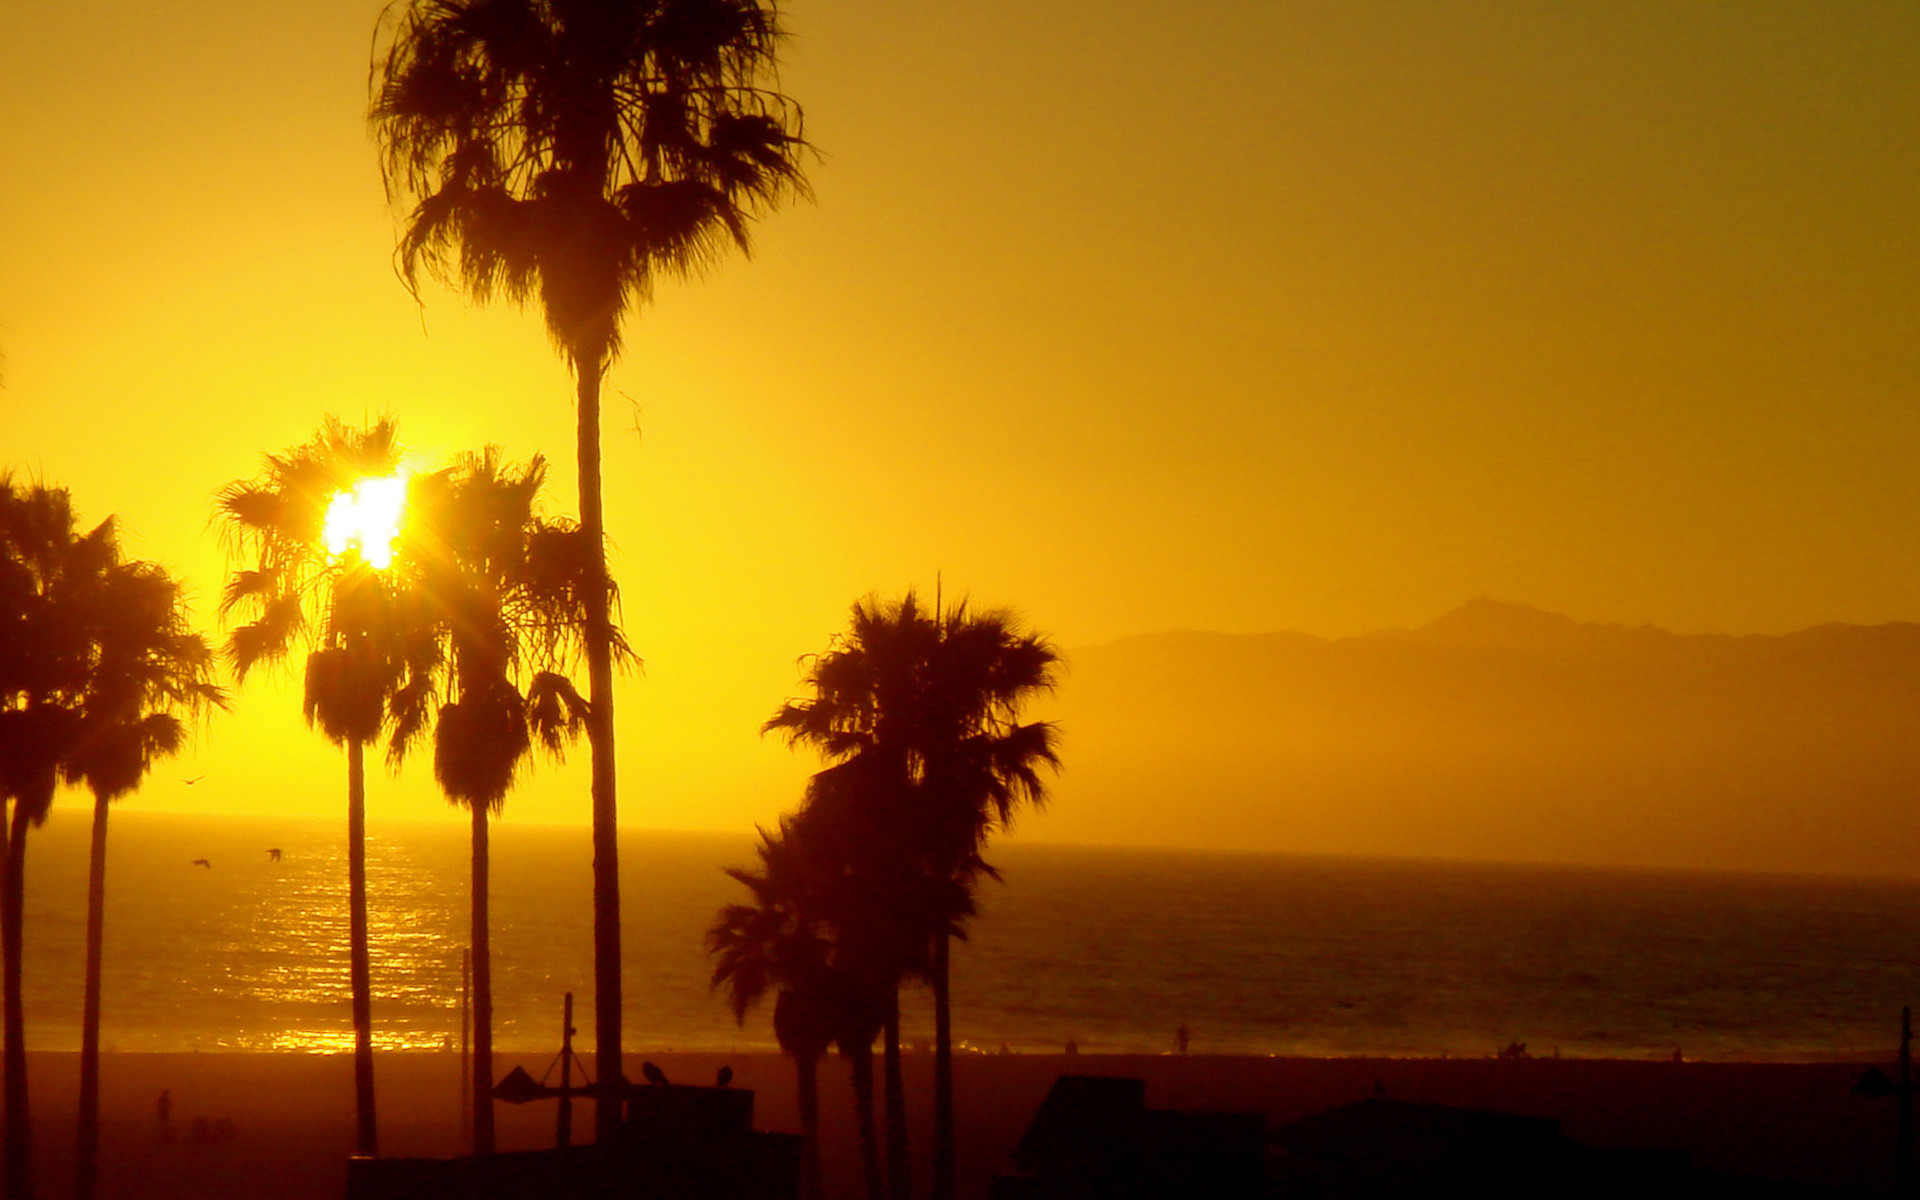 Venice Beach California Wallpaper 67 images 1920x1200